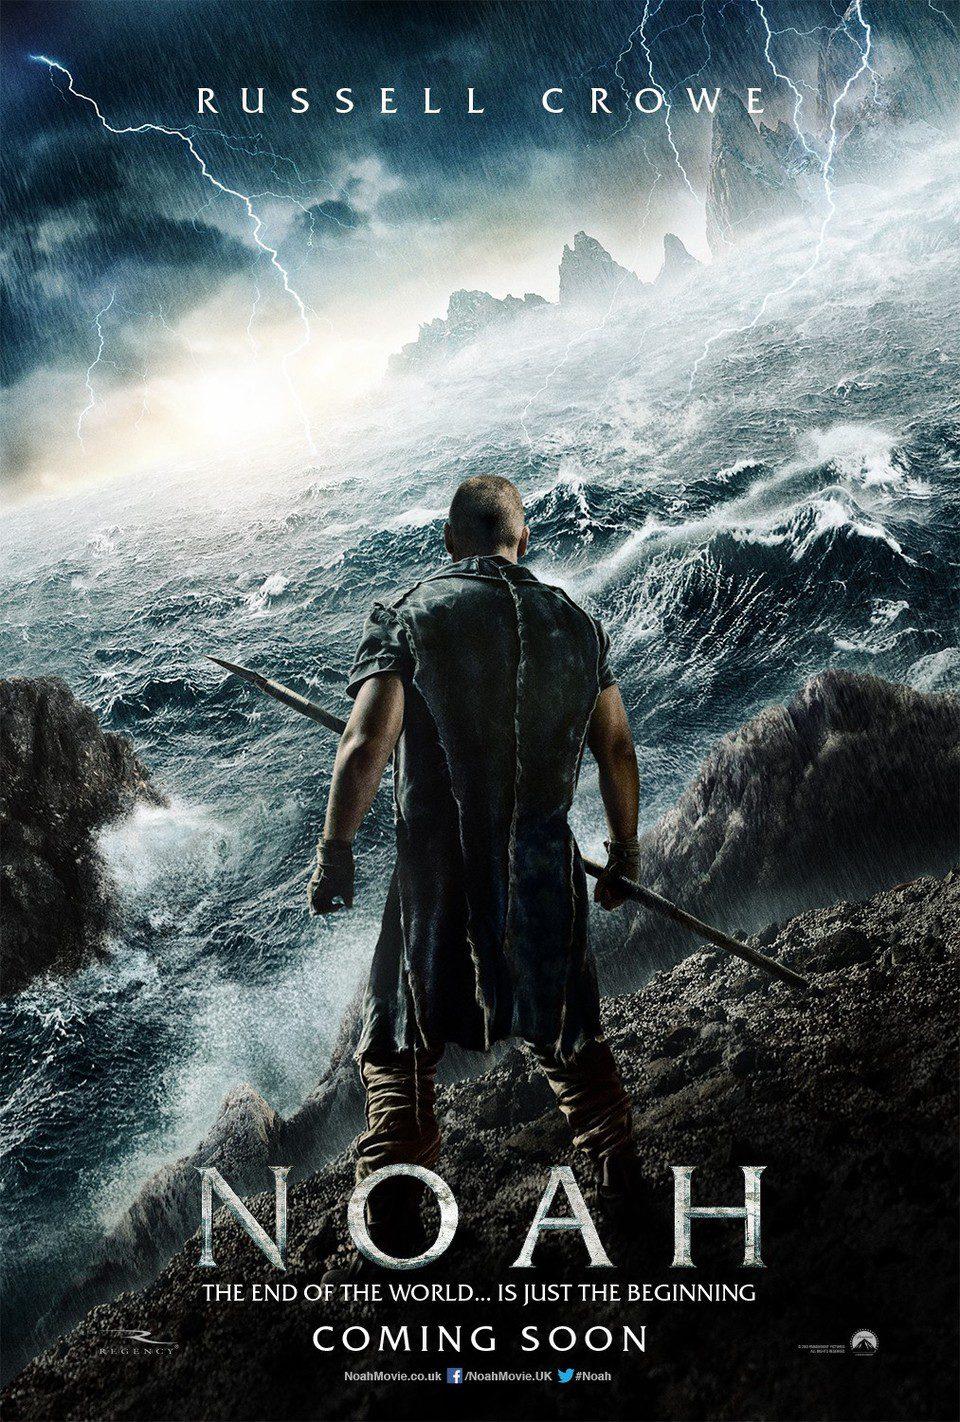 Cartel EEUU de 'Noé'